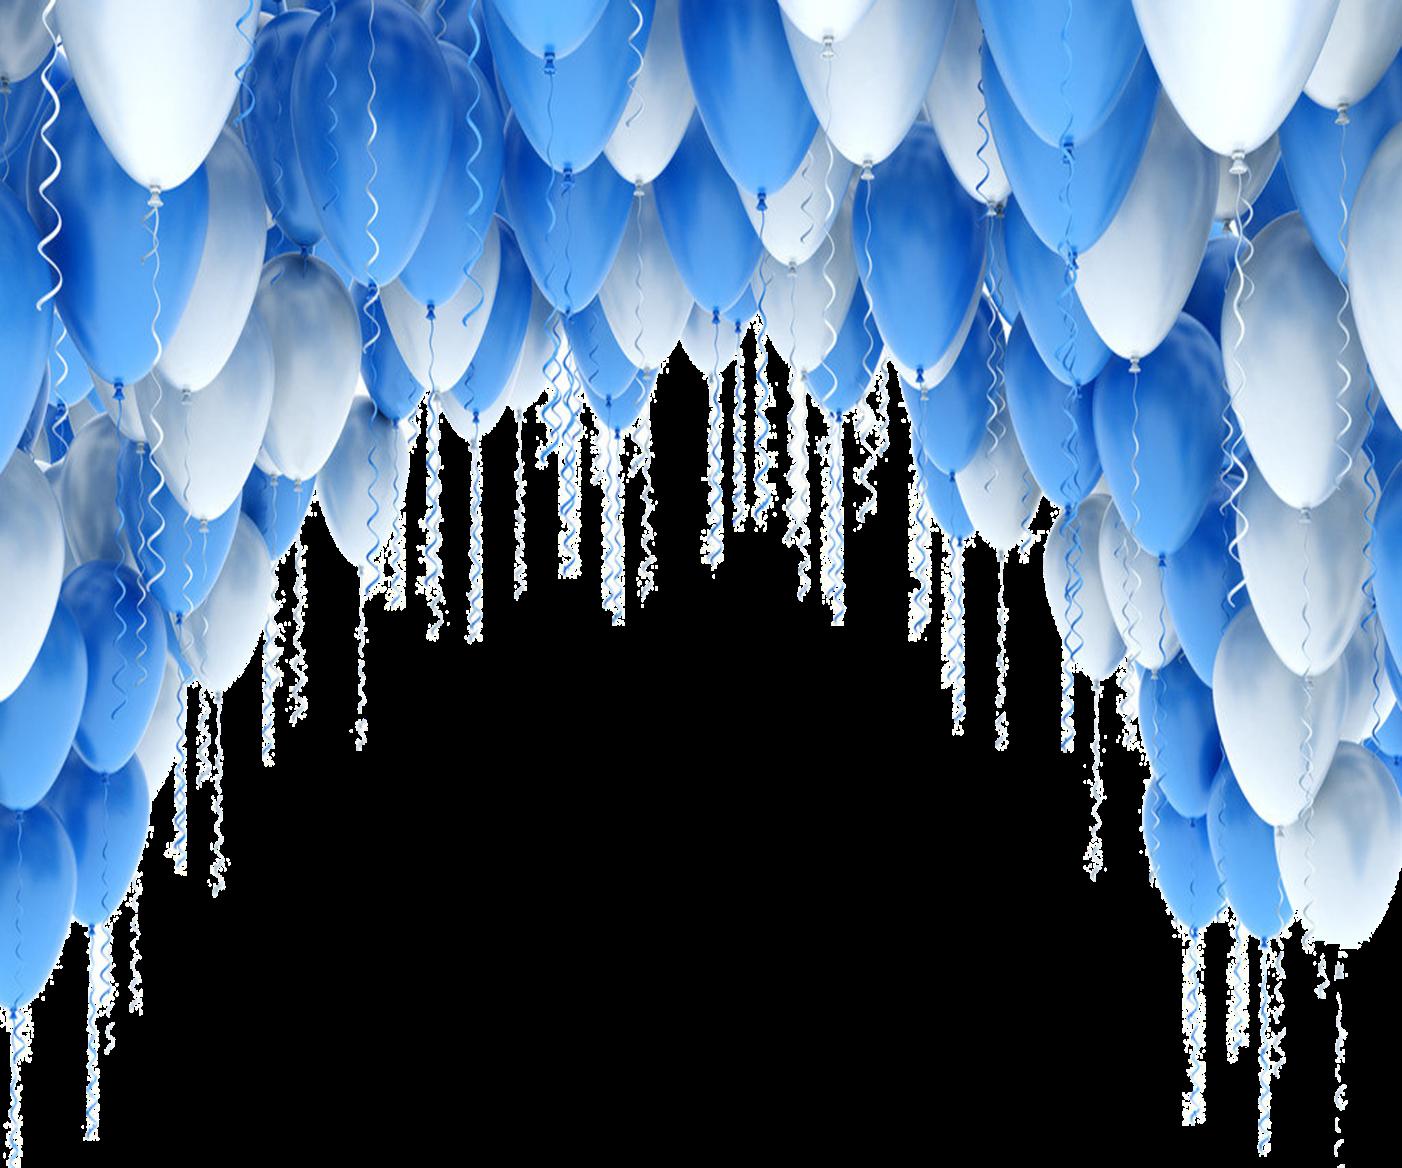 Blue And White Balloons Border Balloon Background Balloon Arch Blue Balloons